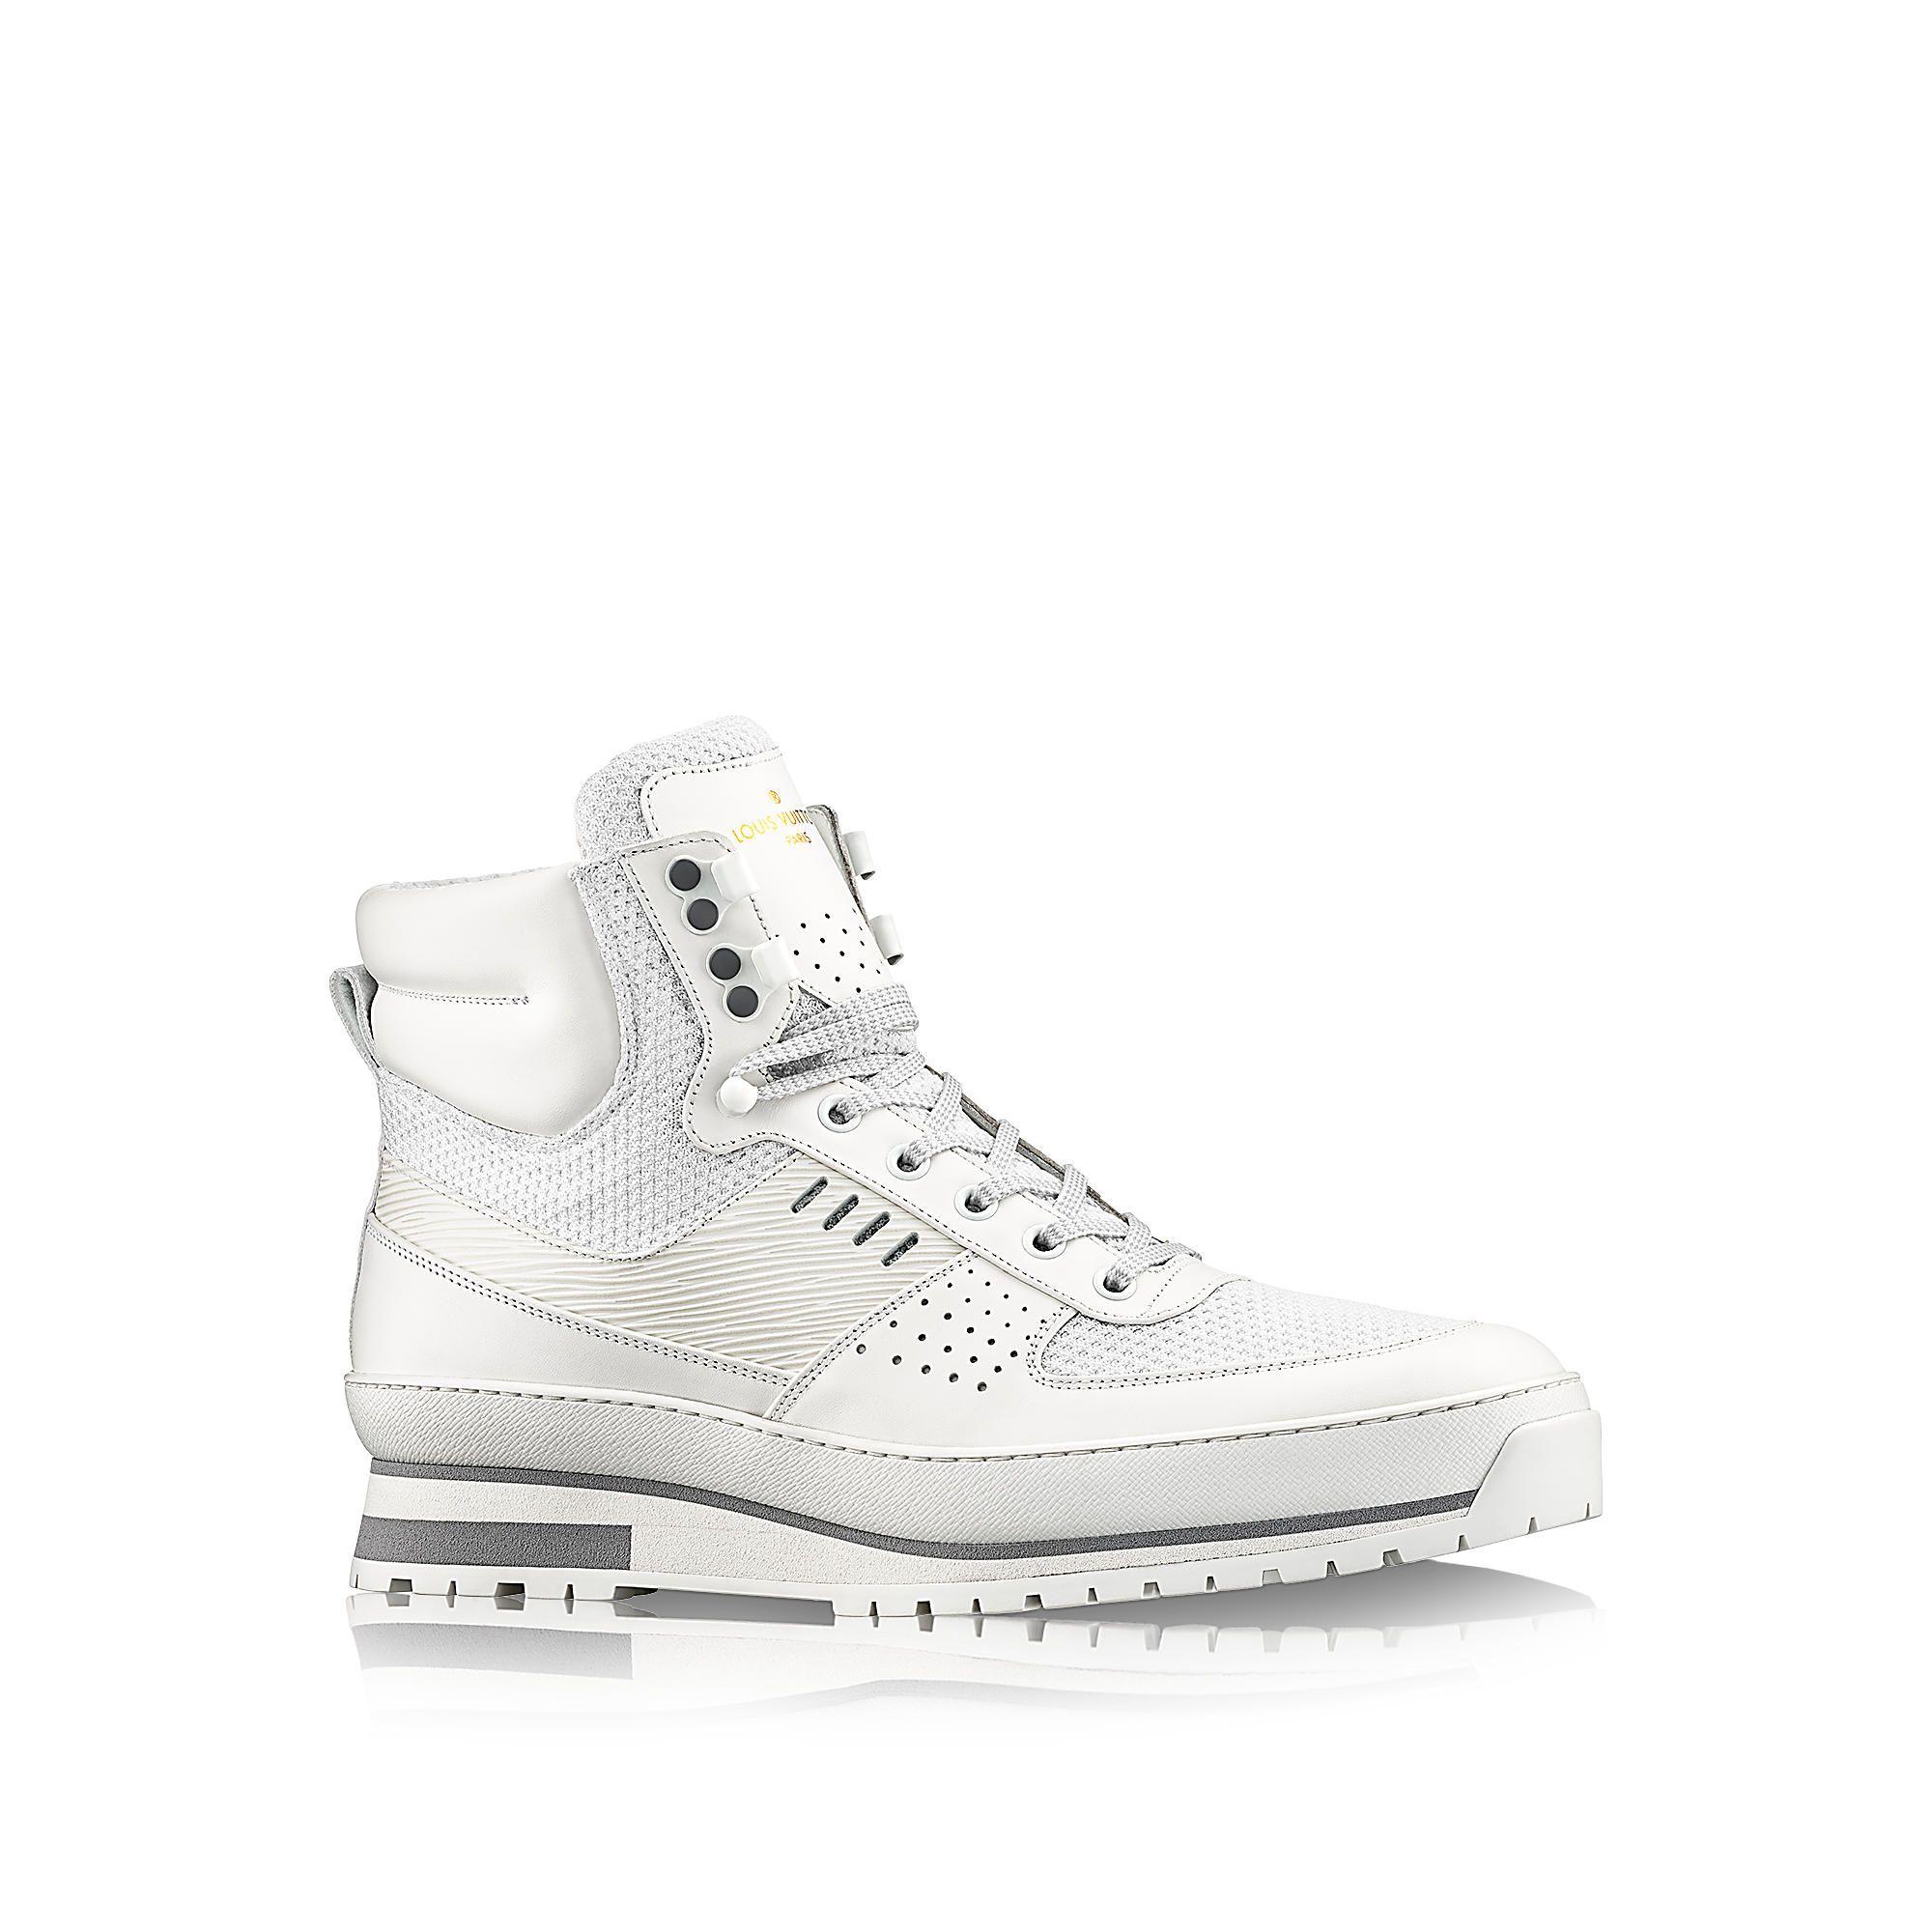 323ccb979d63 Harlem Sneaker via Louis Vuitton   Kicks   Sneakers, Shoes, Louis ...